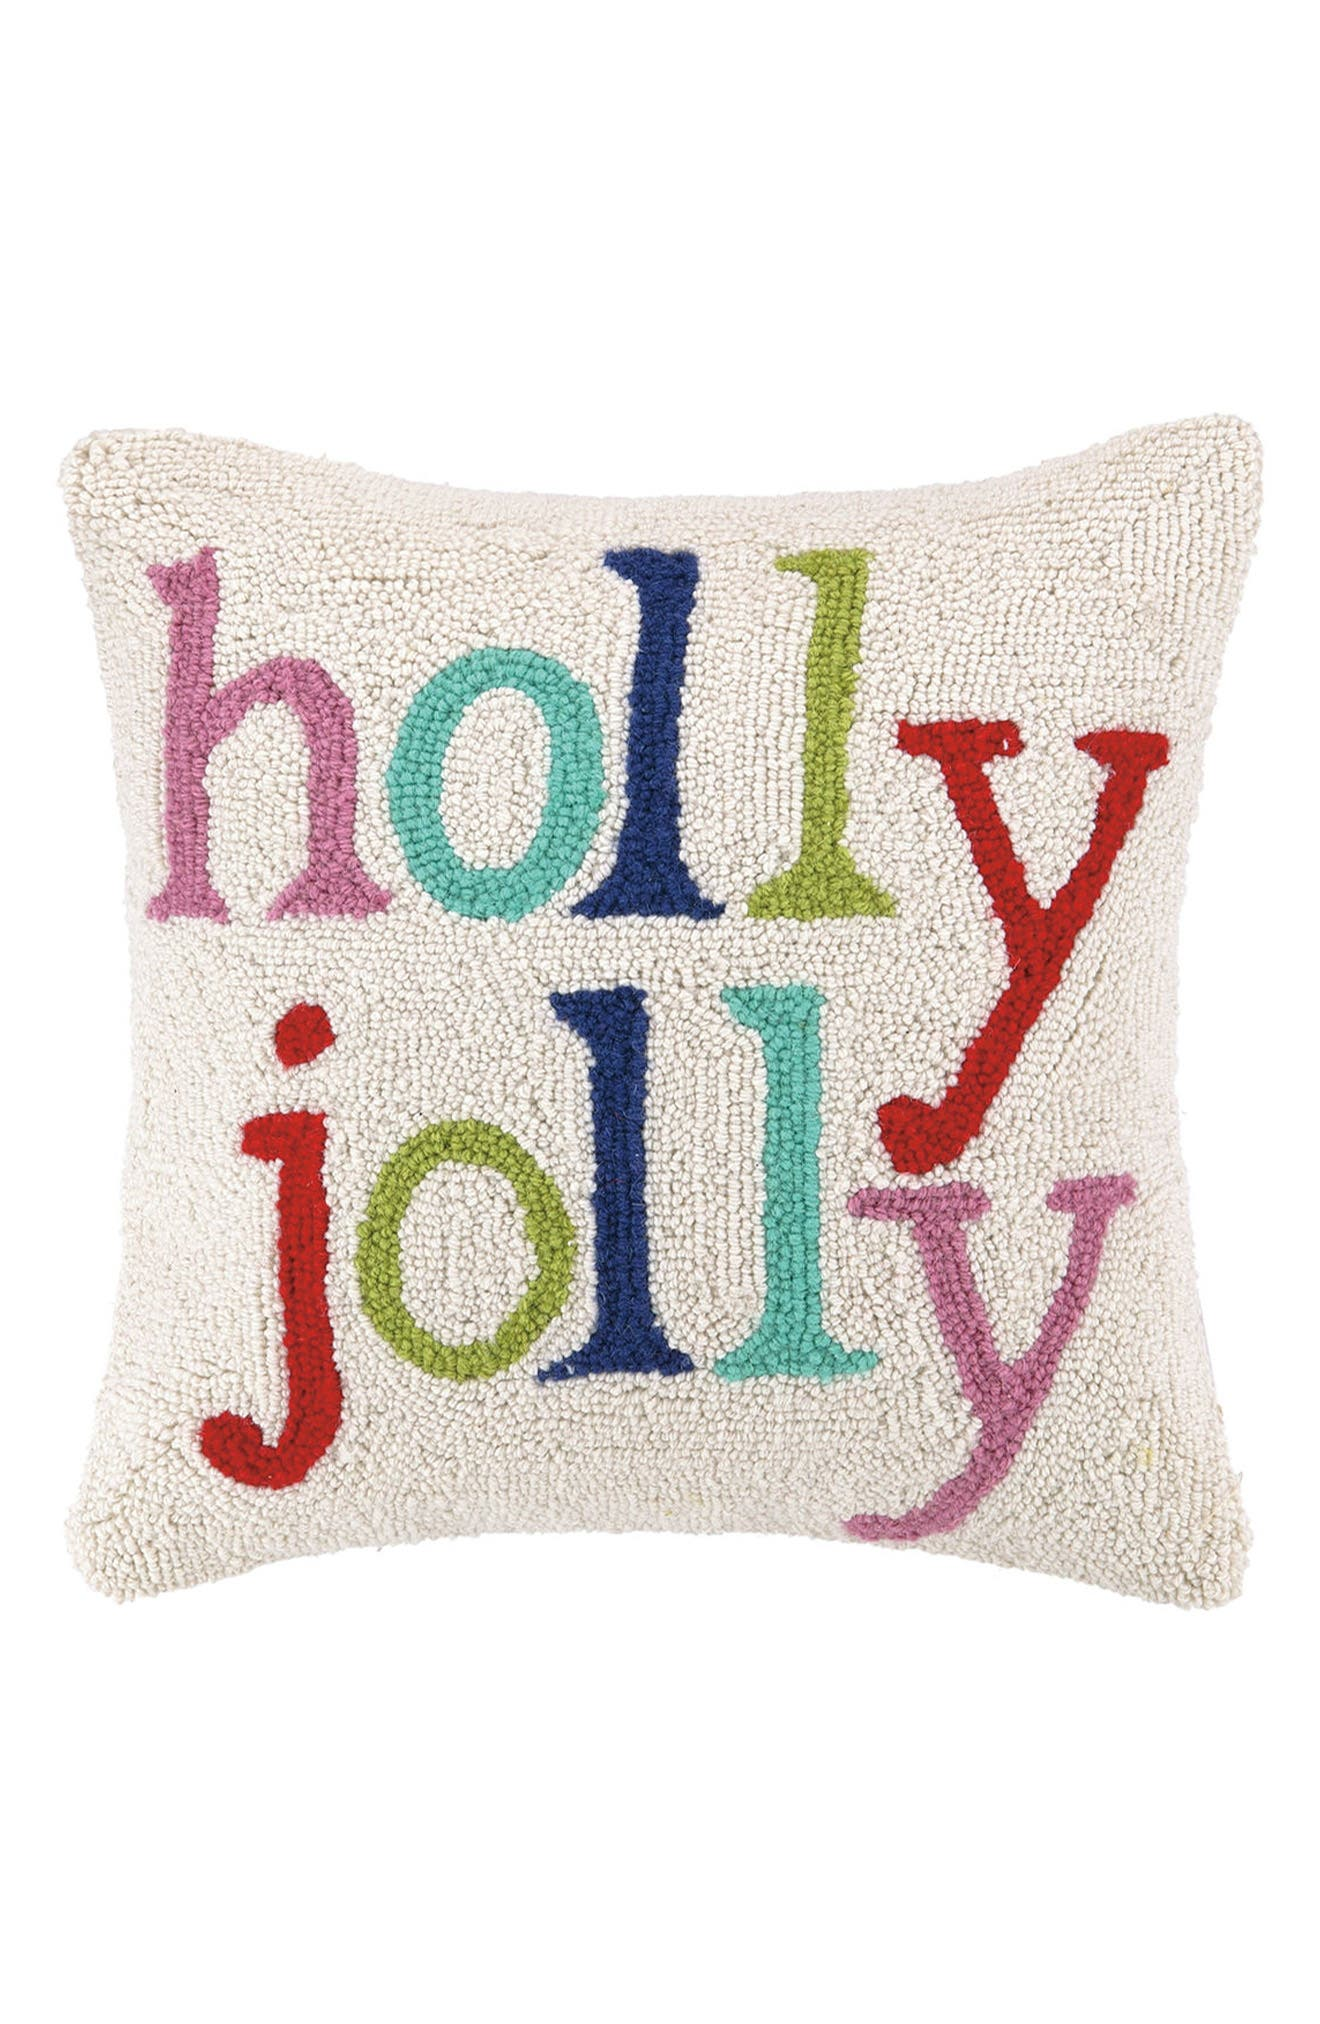 Peking Handicraft Holly Jolly Hooked Accent Pillow